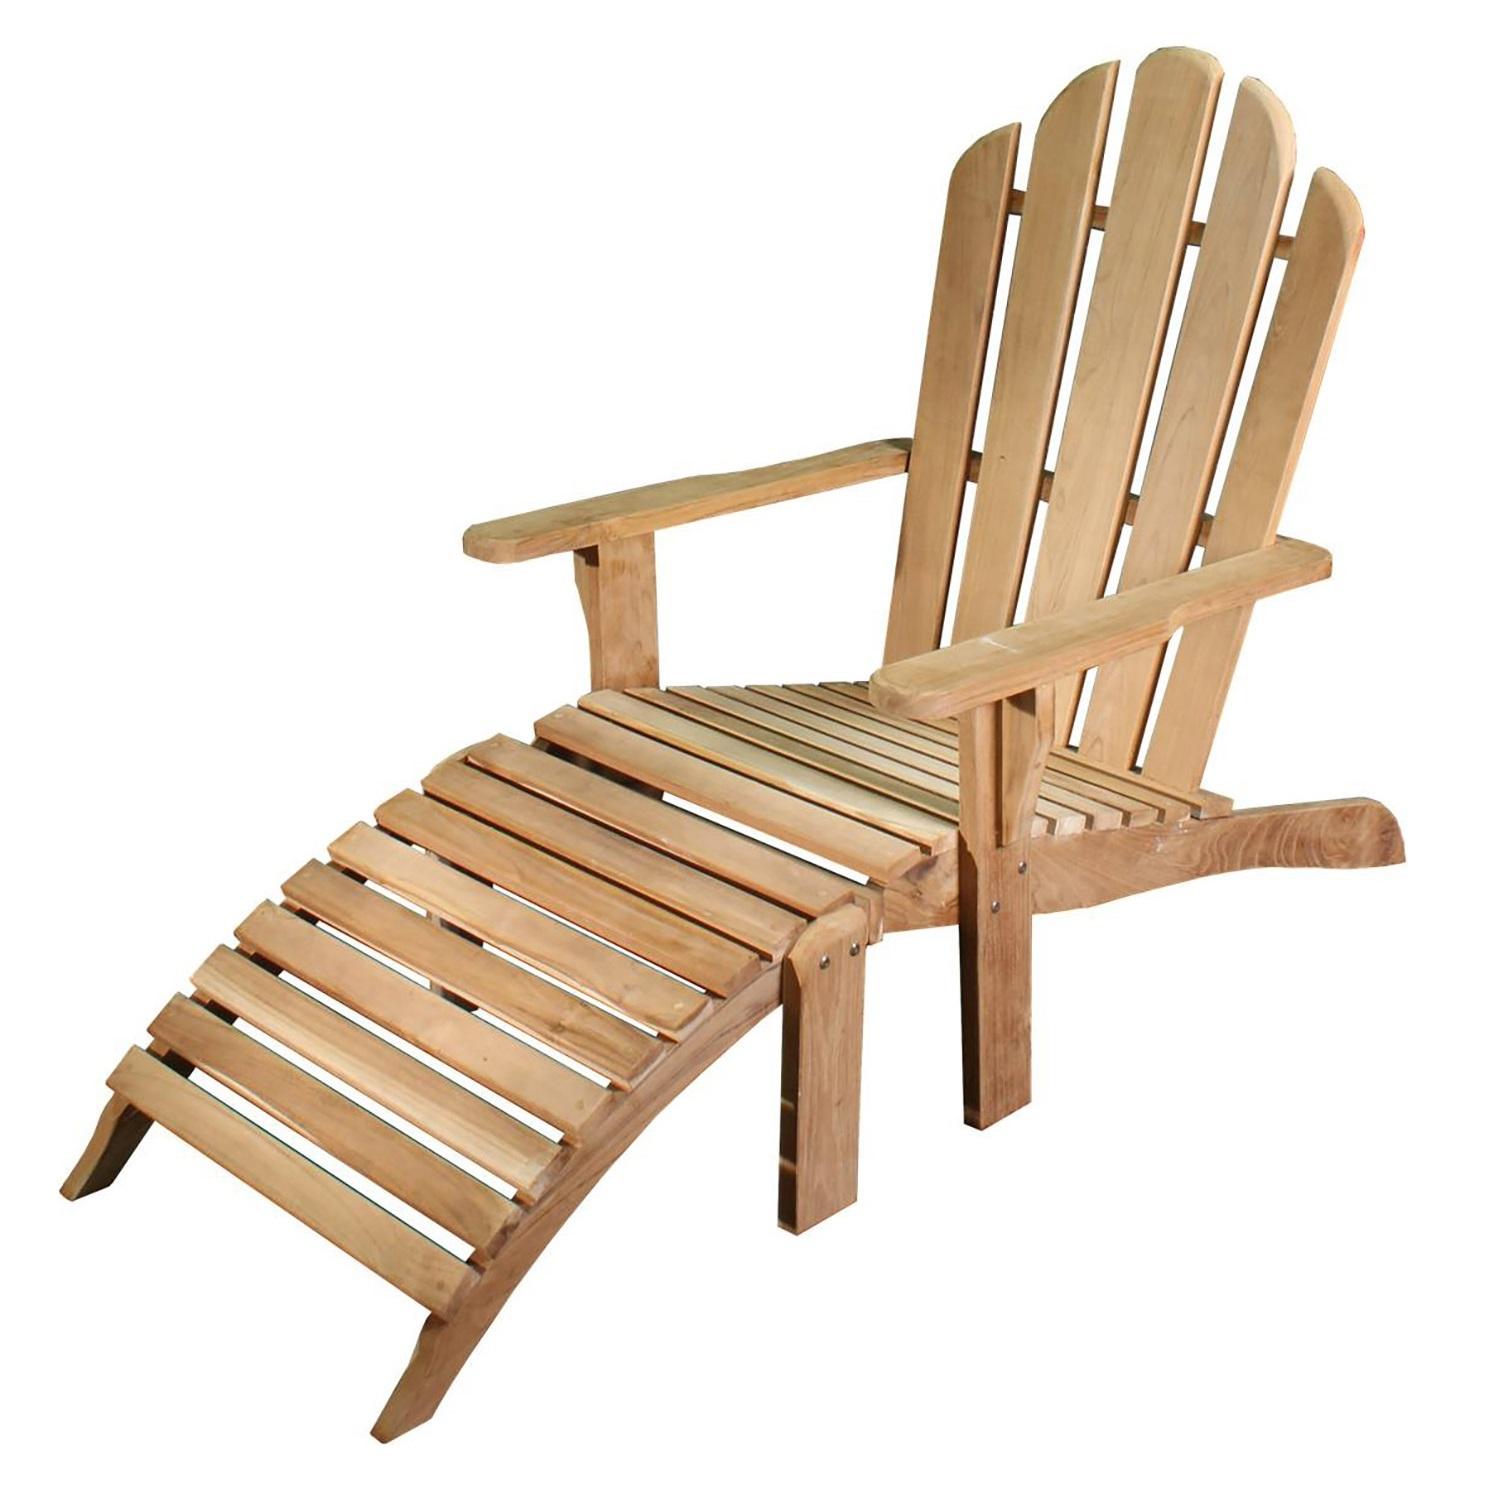 Adirondack stol med skammel i teak 15004